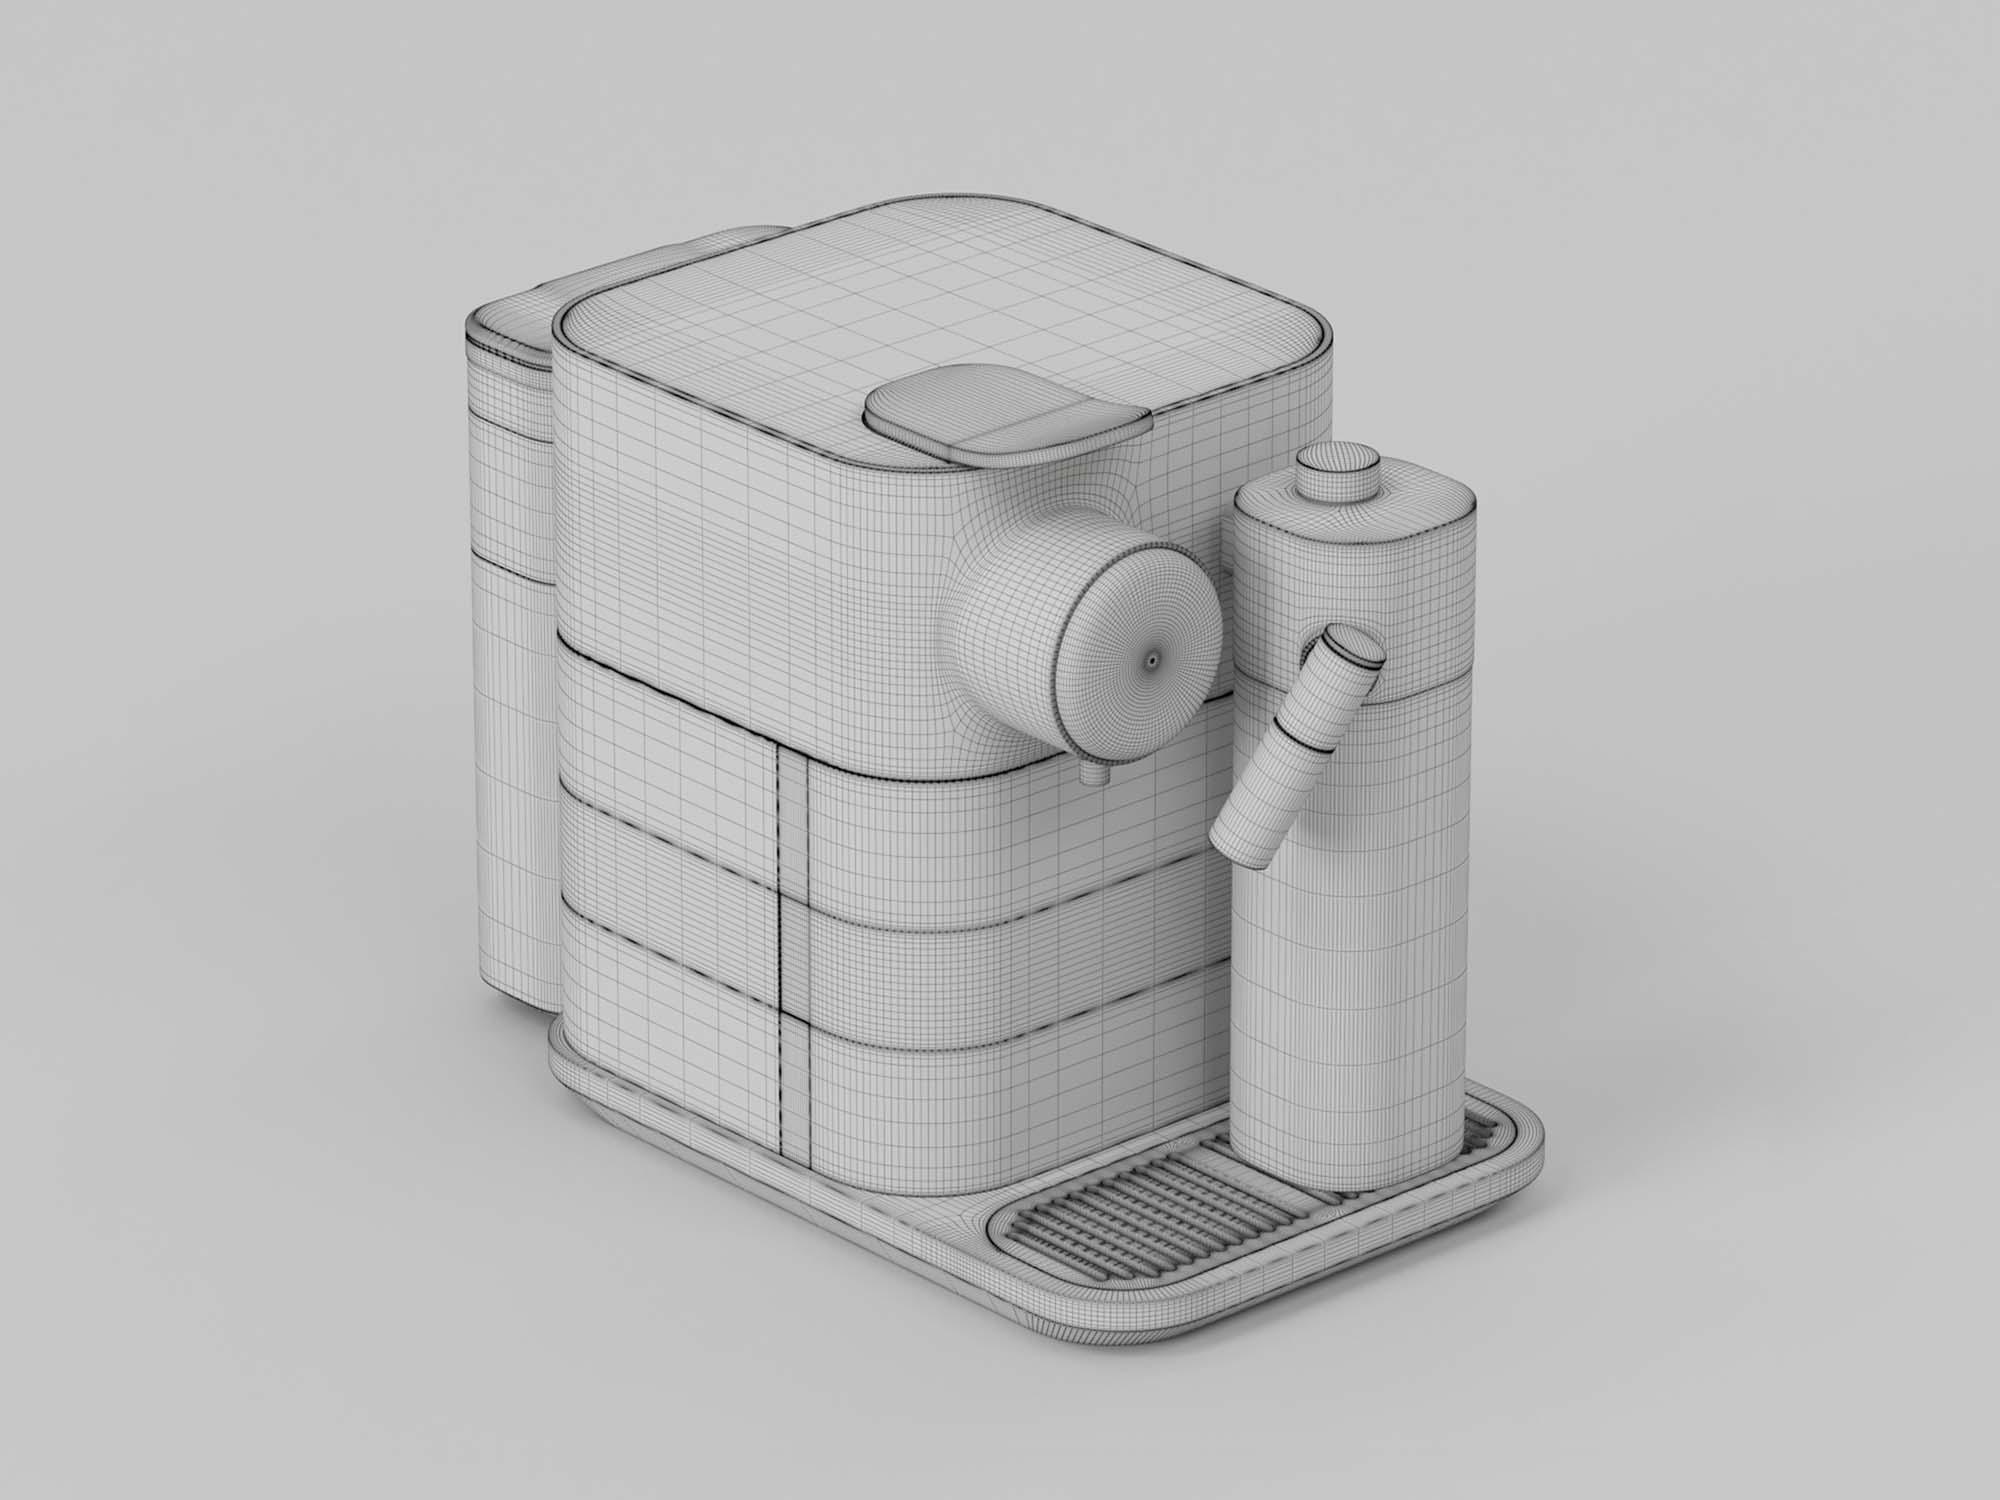 Espresso Machine 3D Model 3